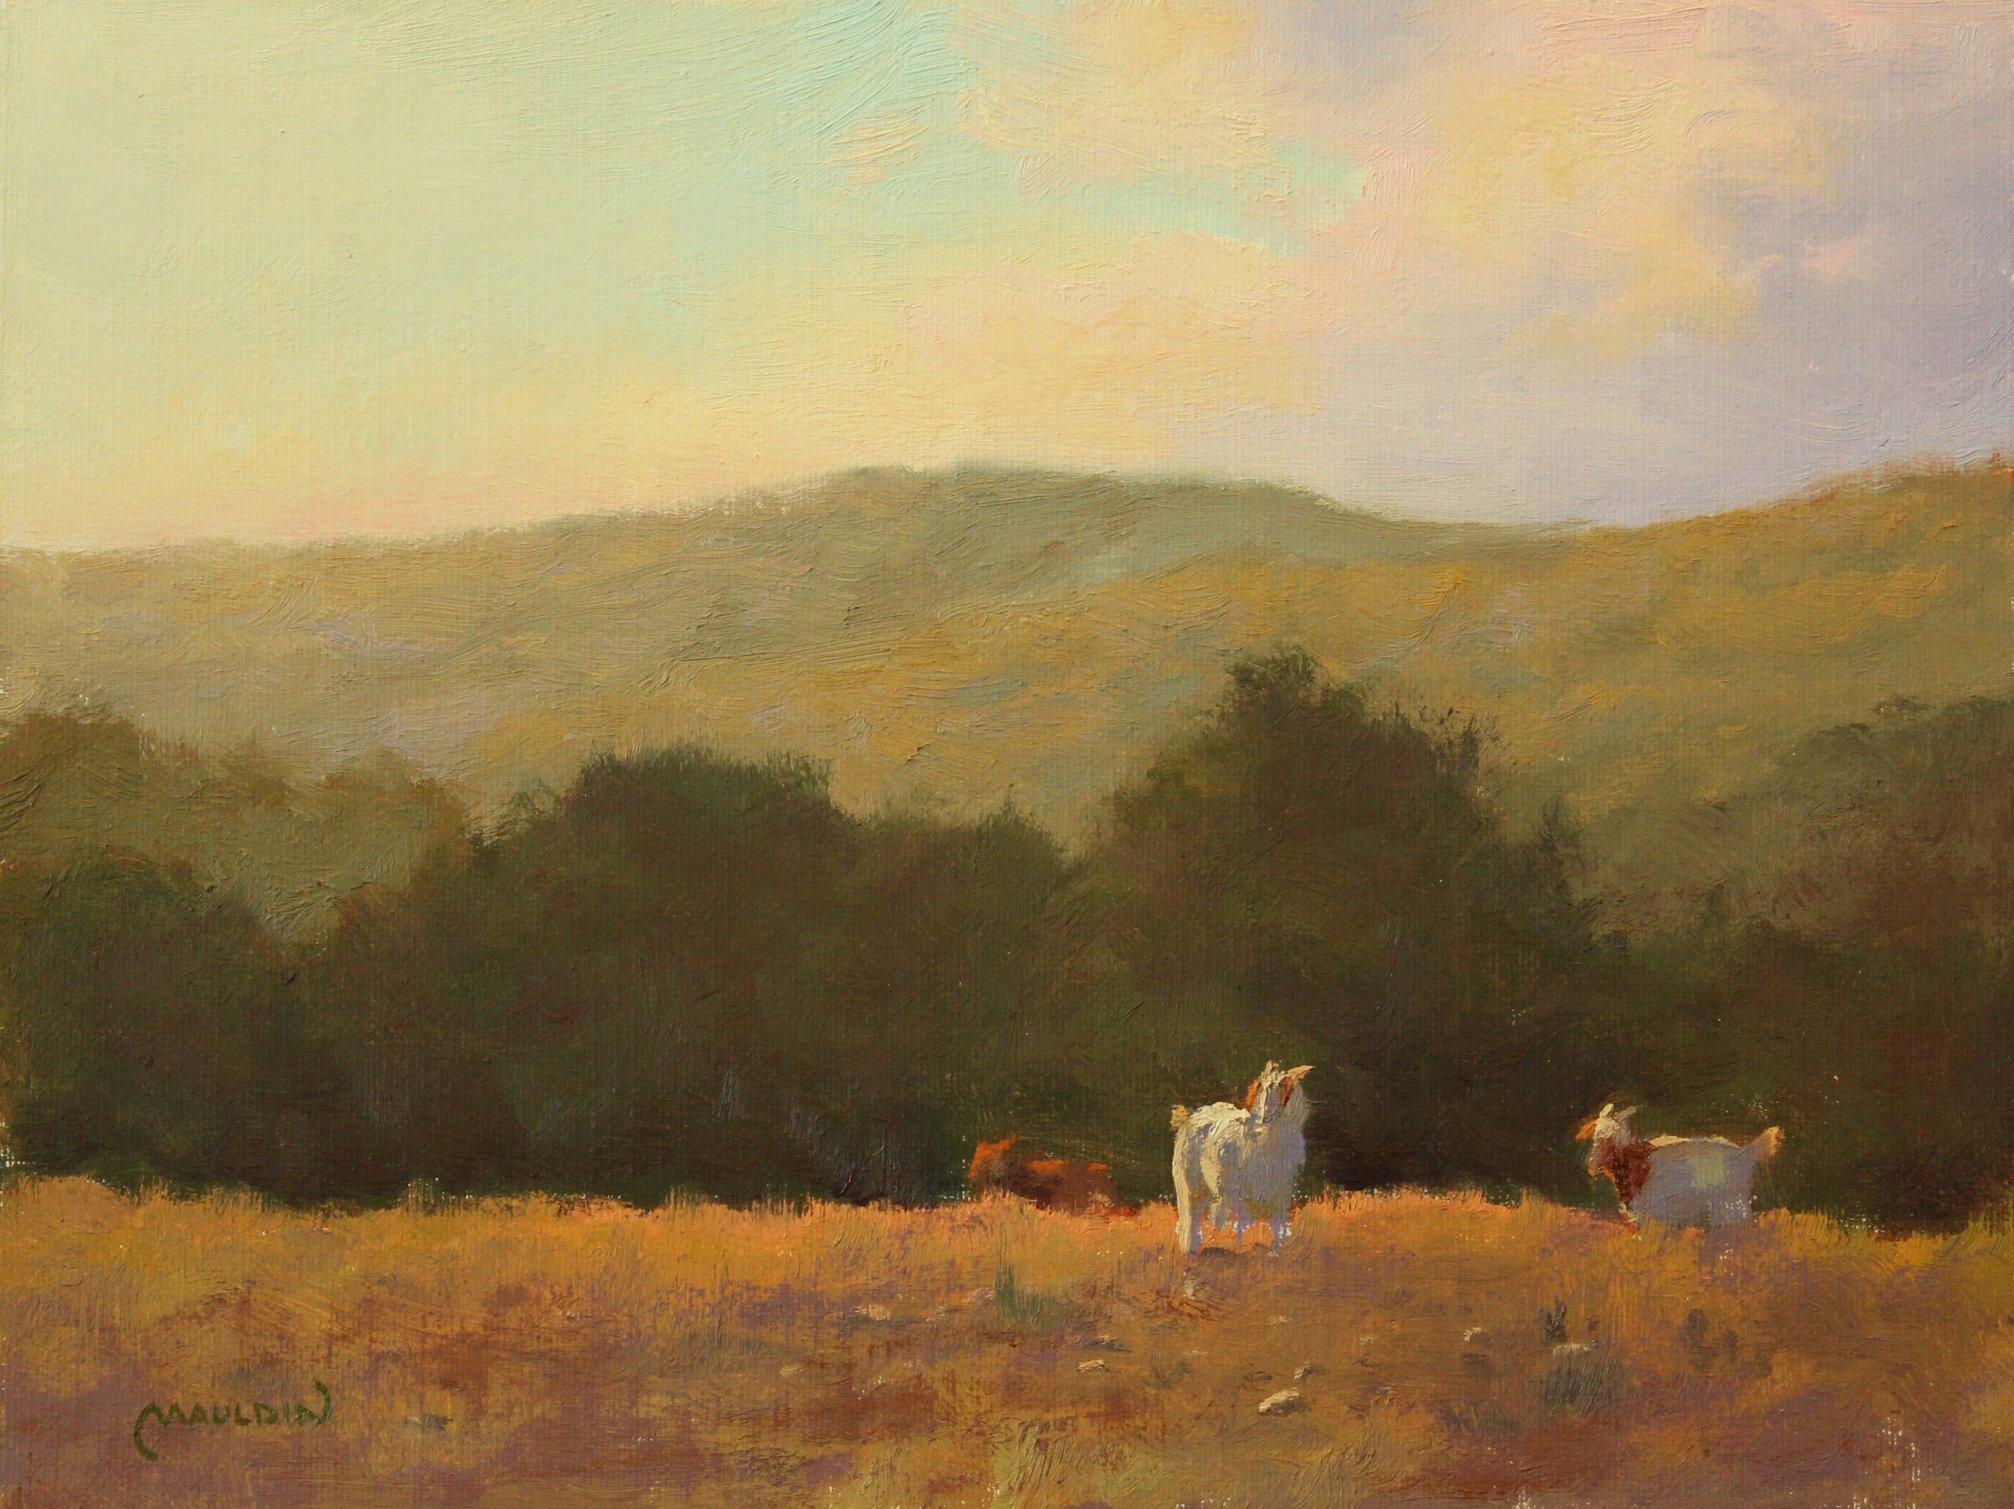 Evening Snack by  Chuck Mauldin - Masterpiece Online